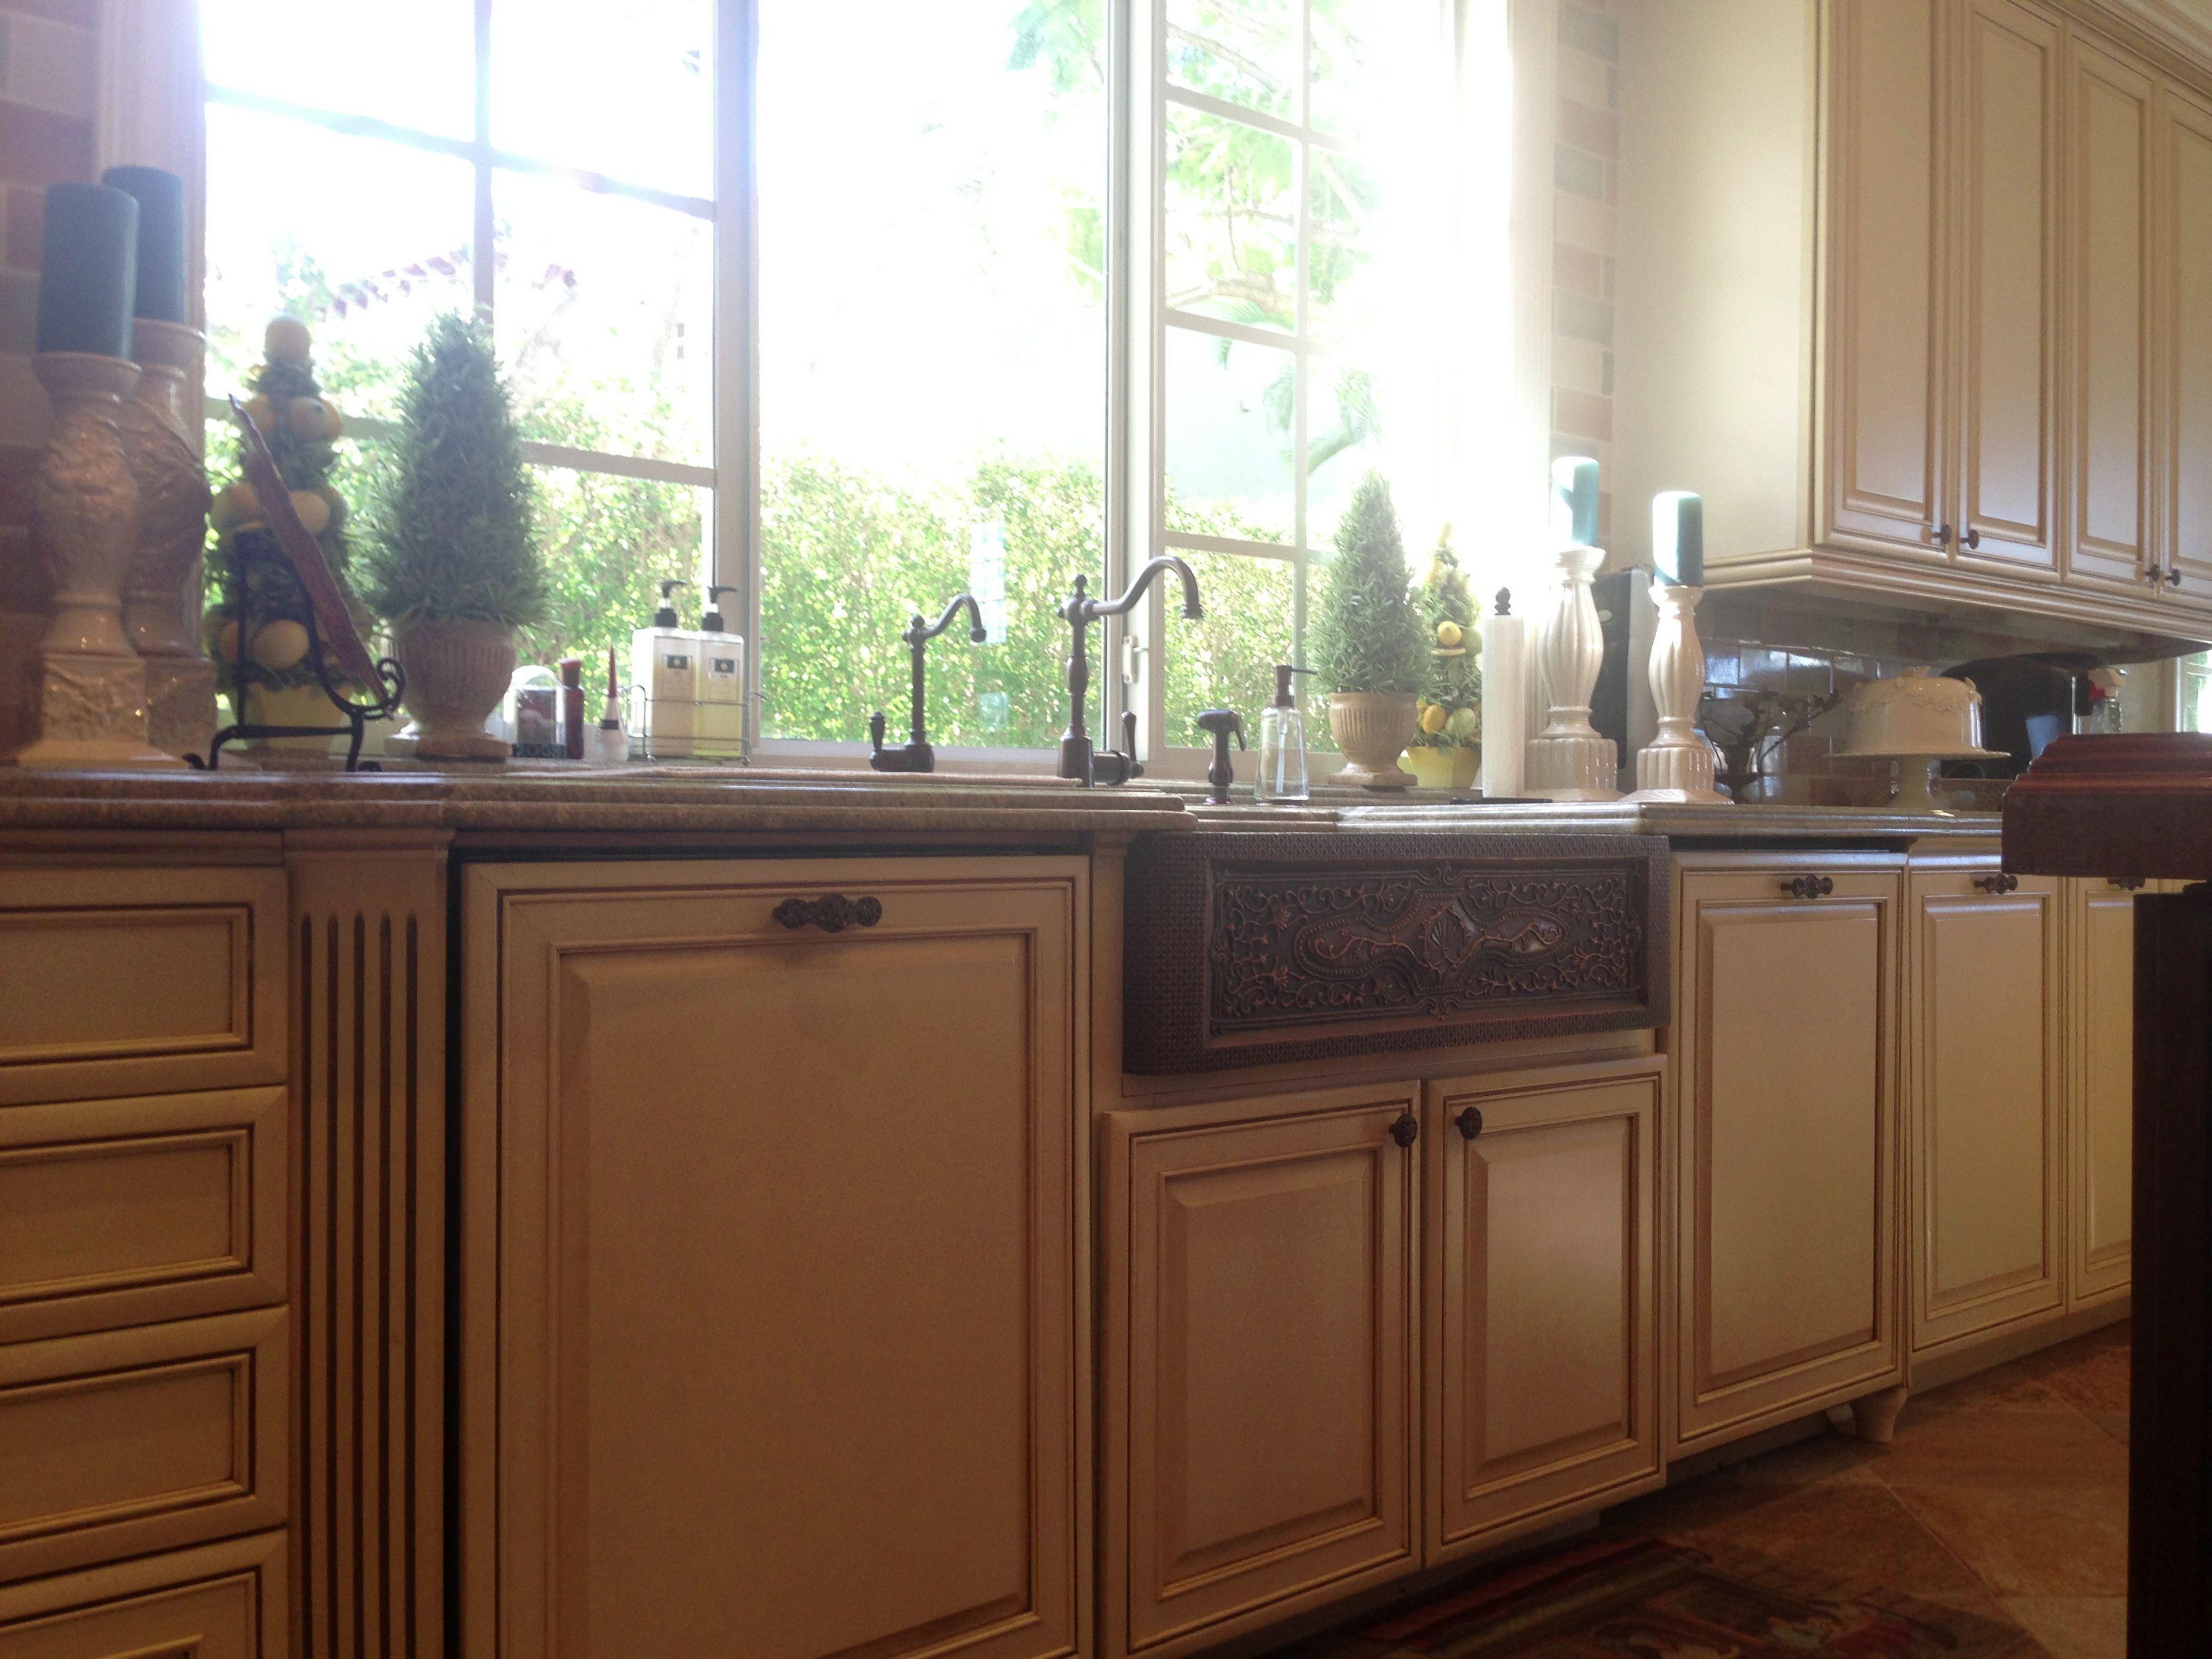 Brown Farmhouse Sink : Pin by Lisa Brown on apron/farmhouse sinks Pinterest